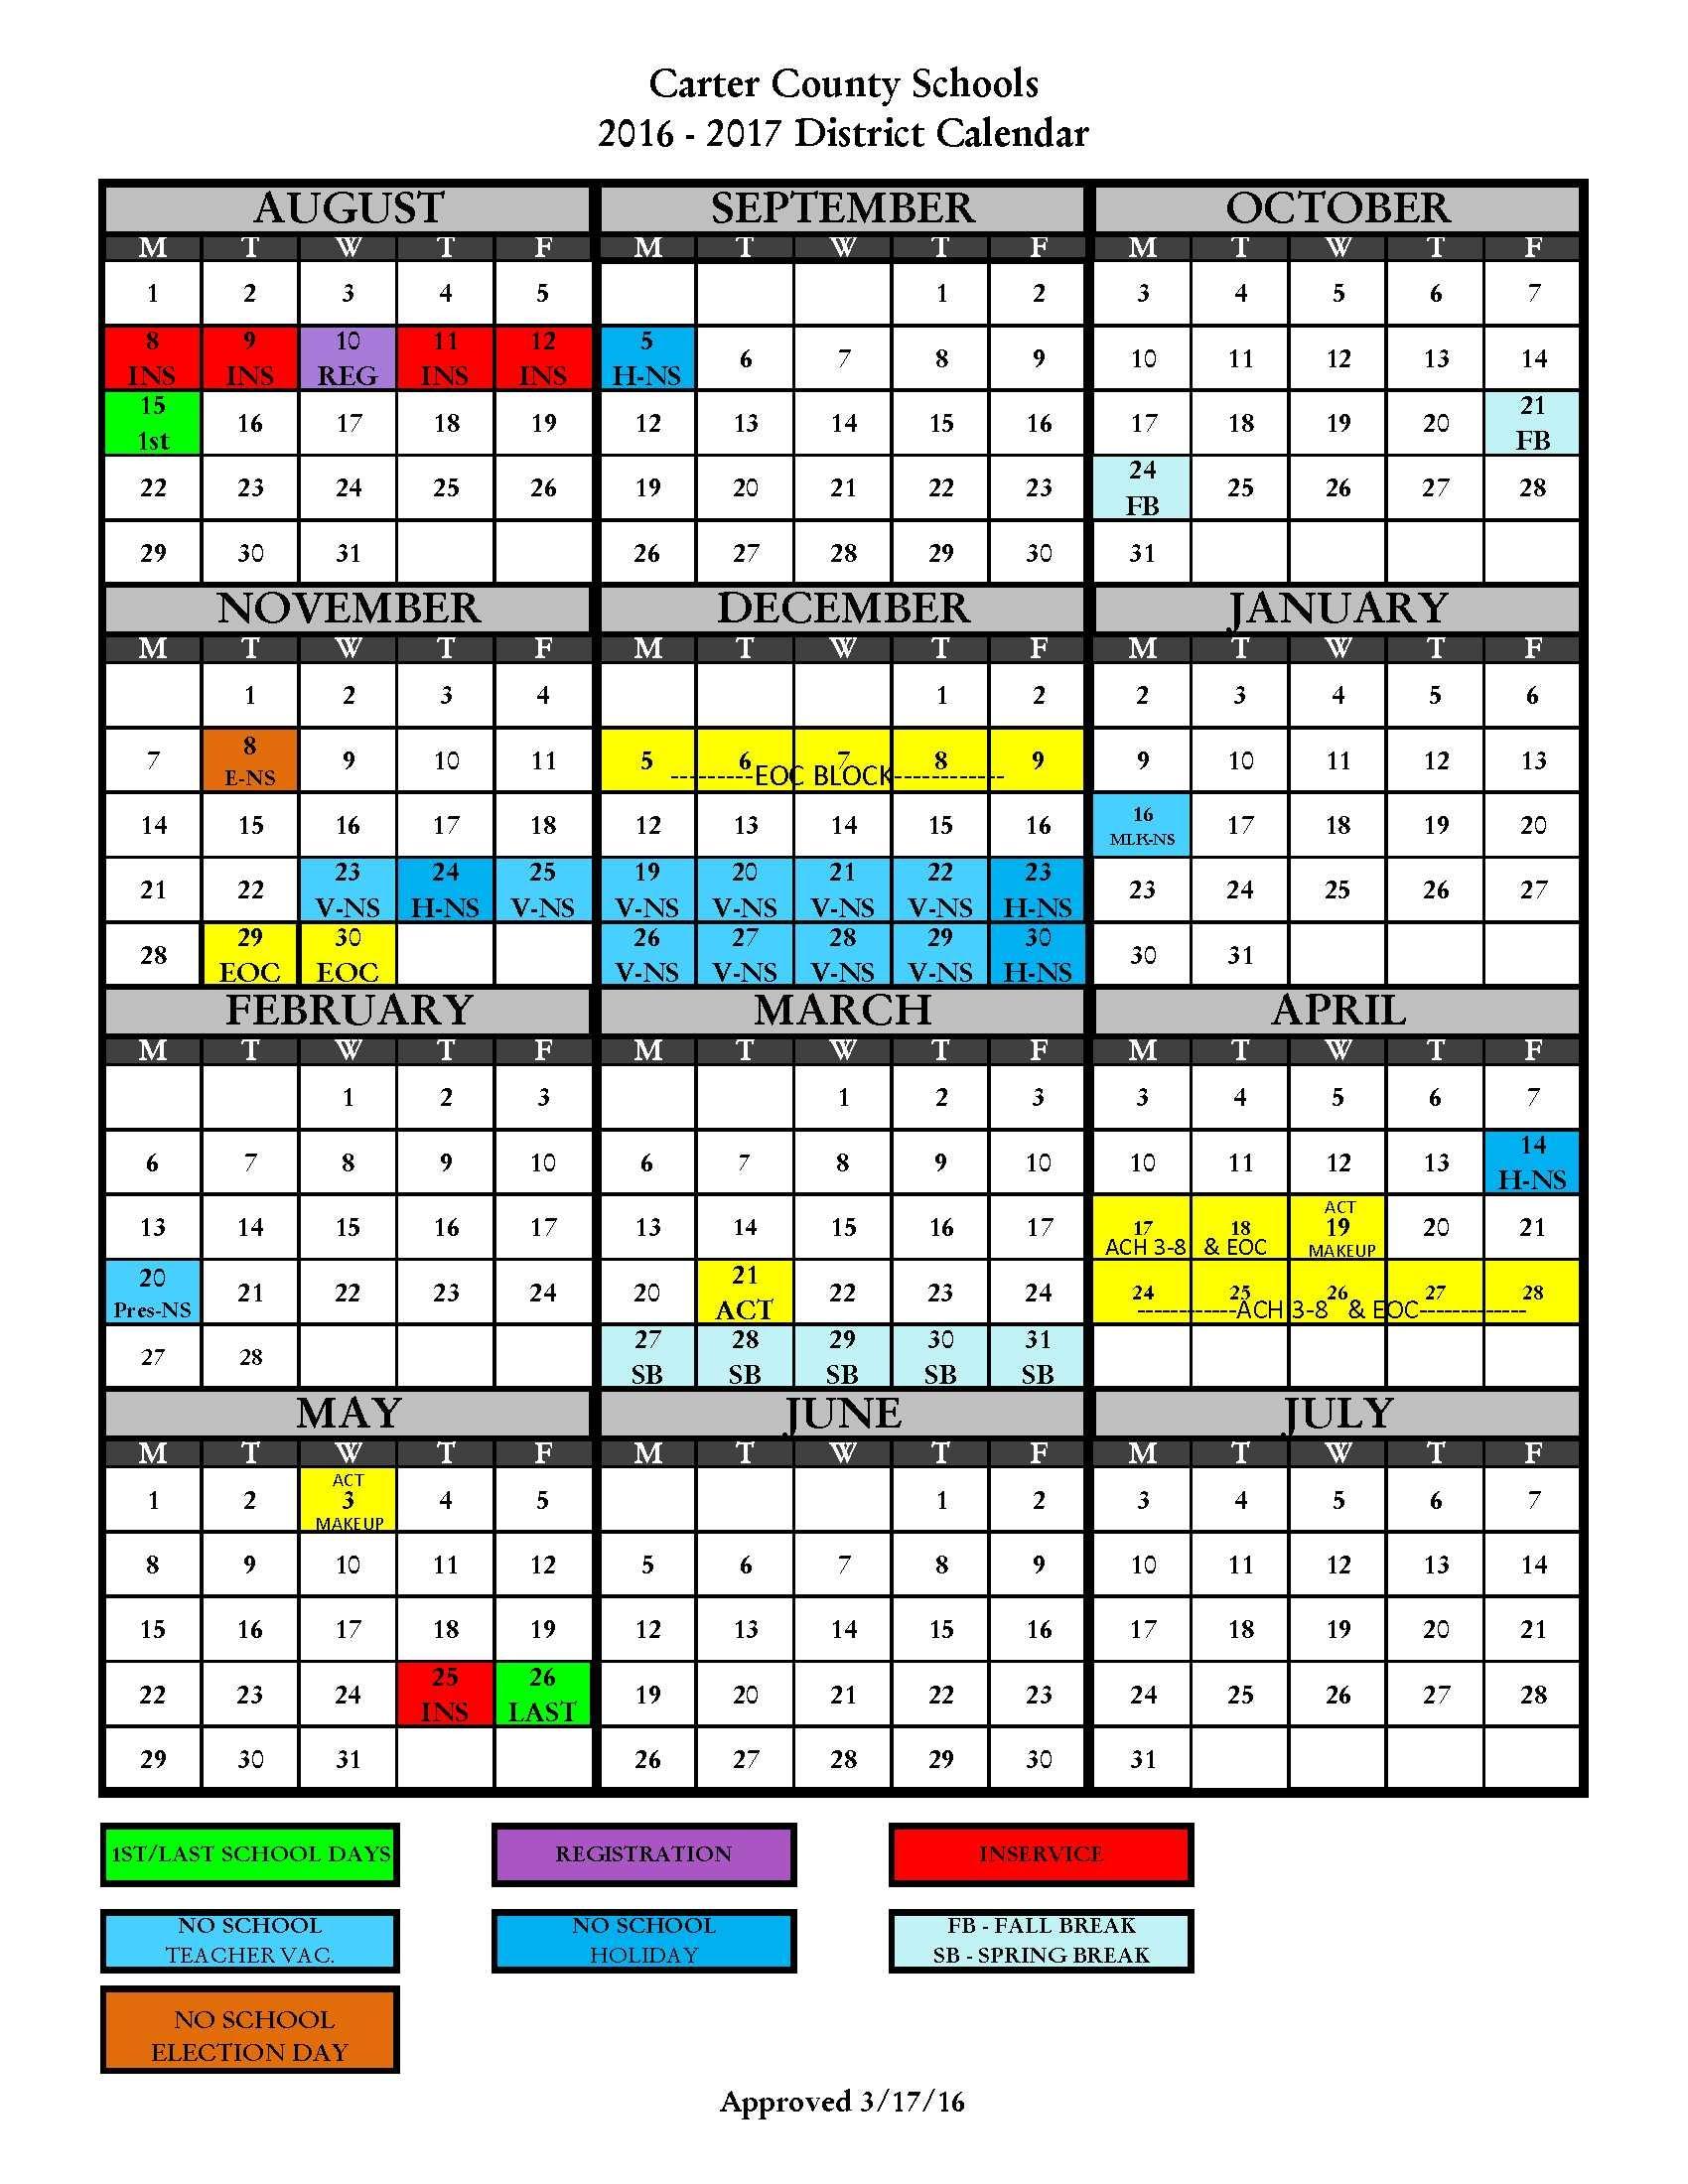 2016 2017 District Calendar – Carter County Schools For Burke County Public Schools Nc Calendar